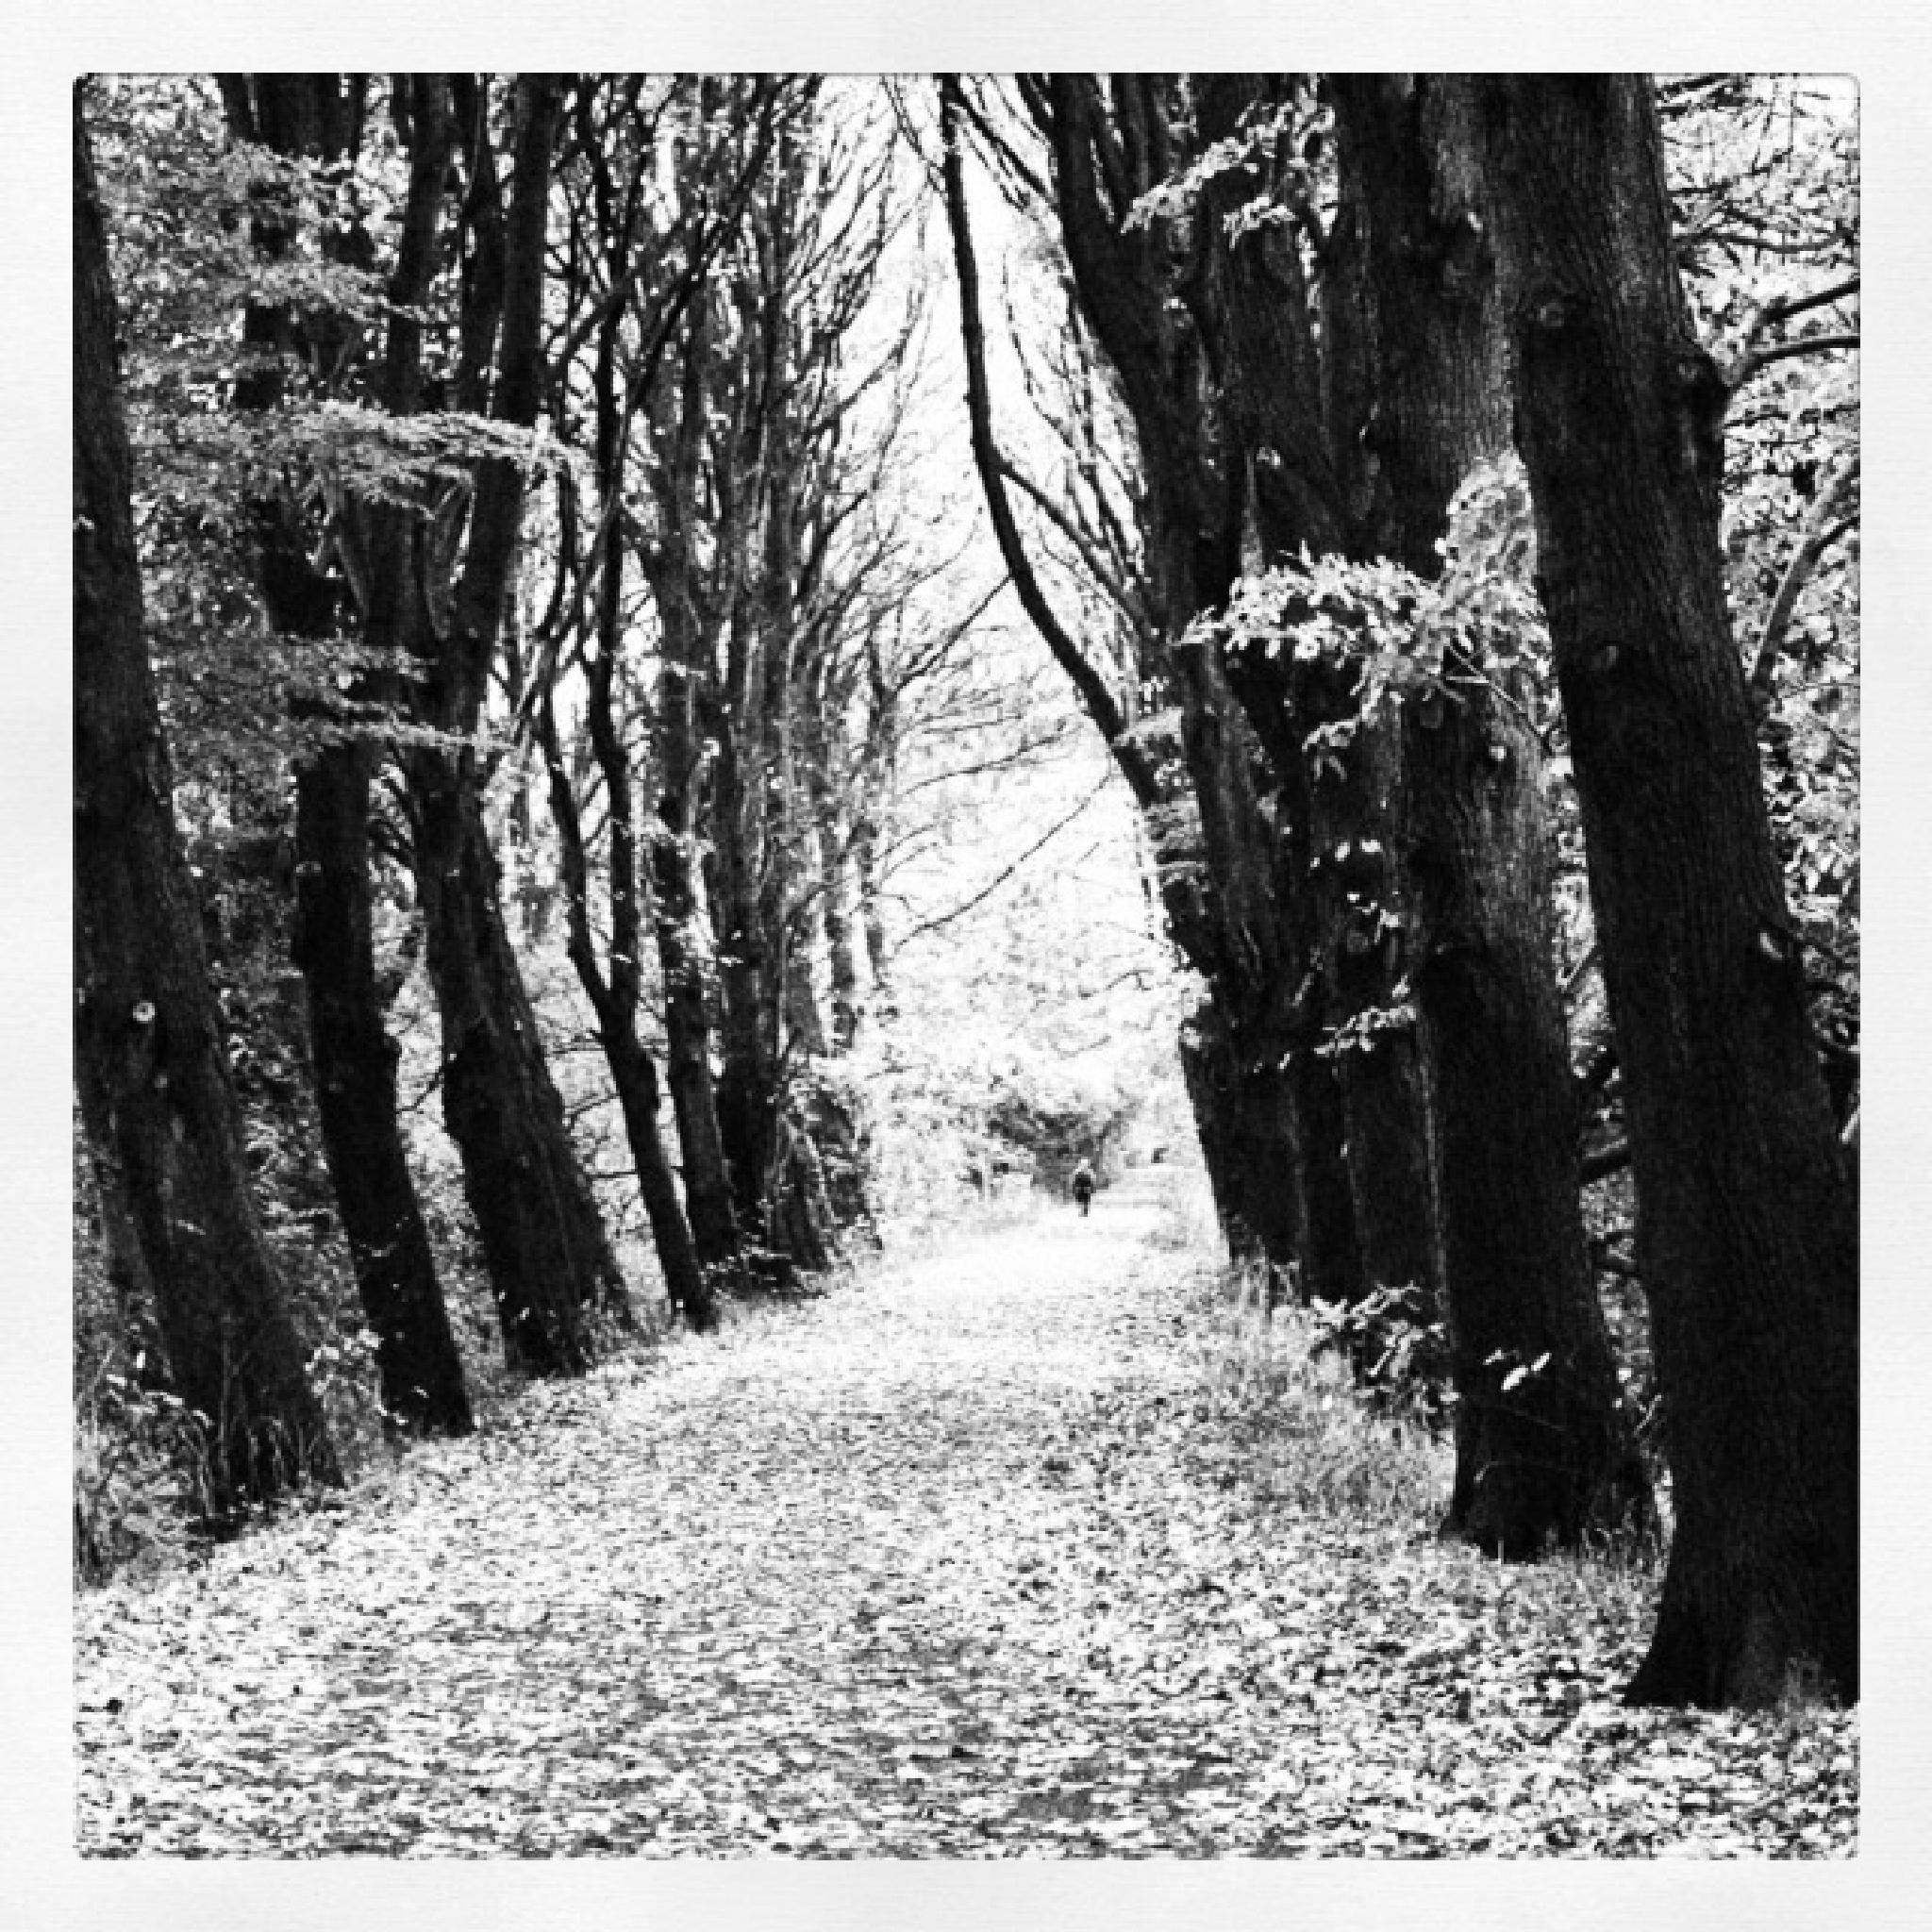 An autumn walk through the avenue of trees by Paul Stobbs